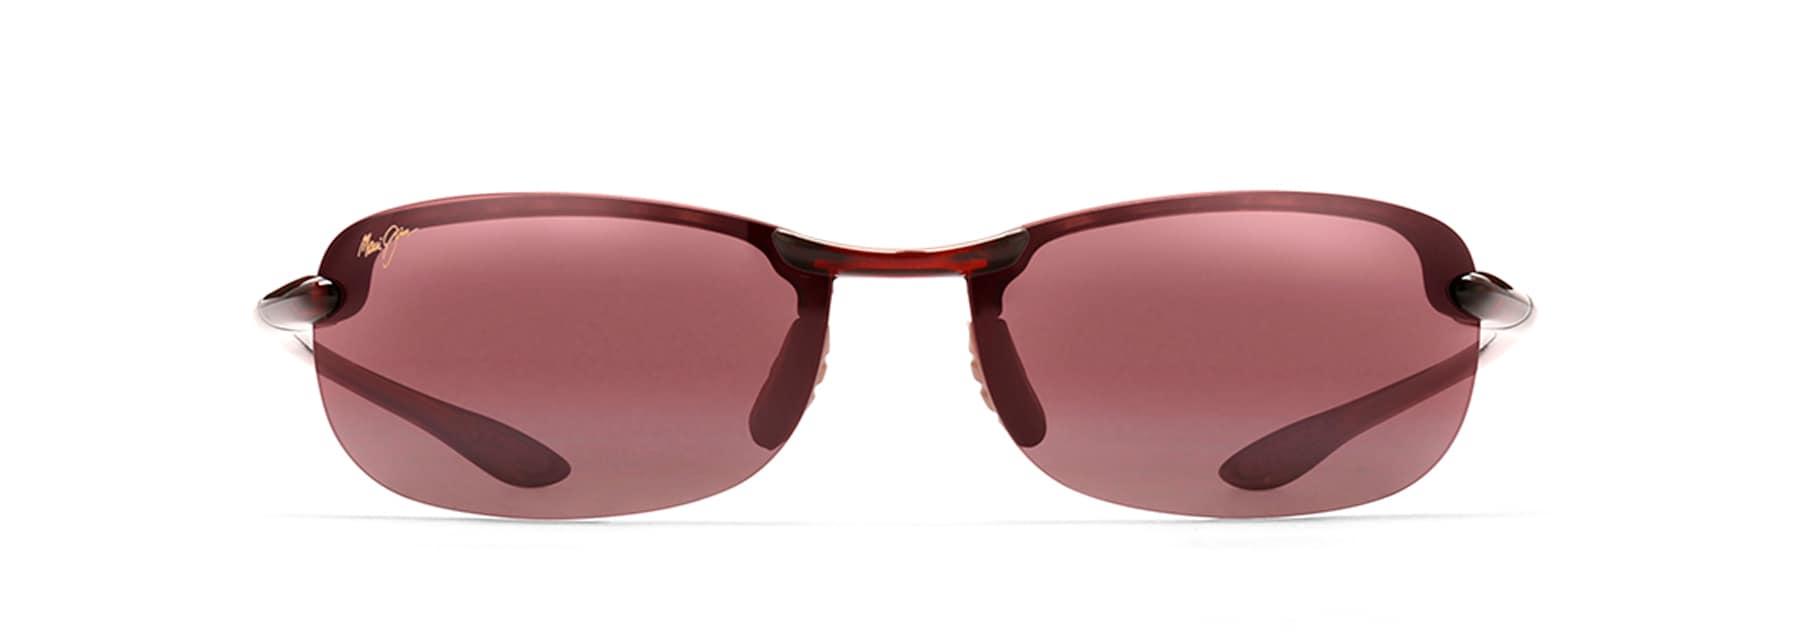 50bf9704f588f Makaha Polarized Sunglasses